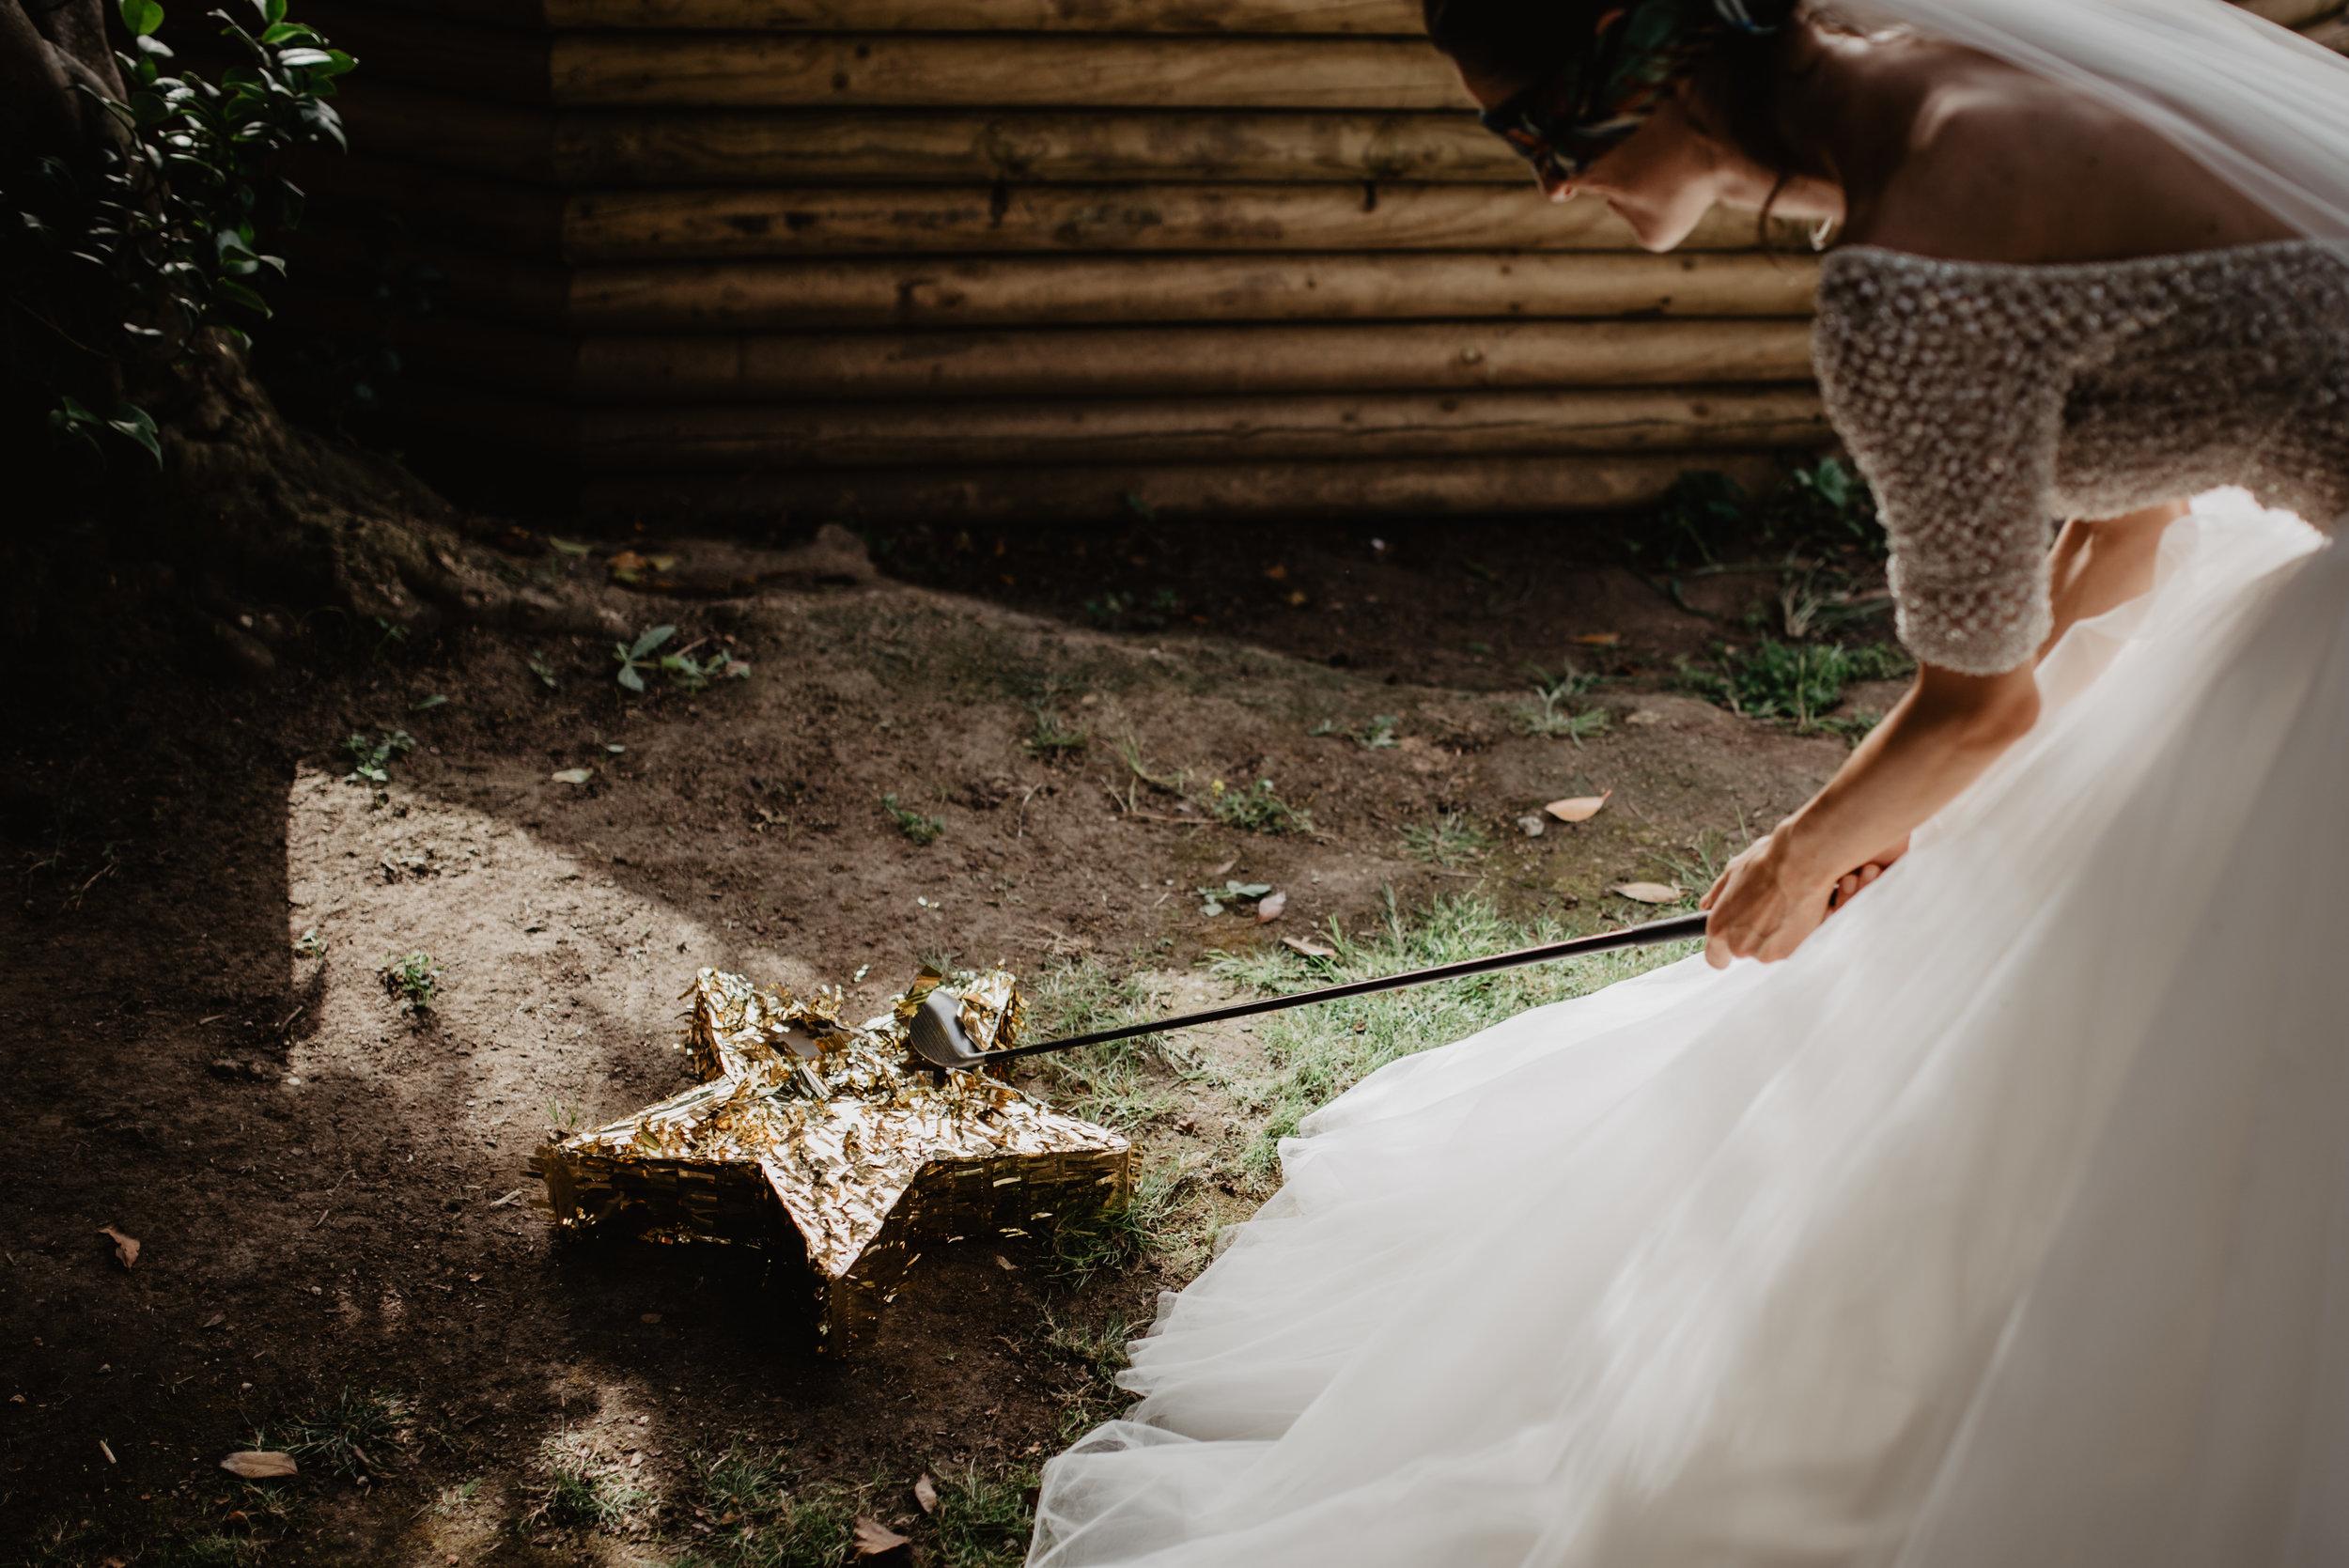 Lapela-photography-wedding-sintra-portugal-86.jpg